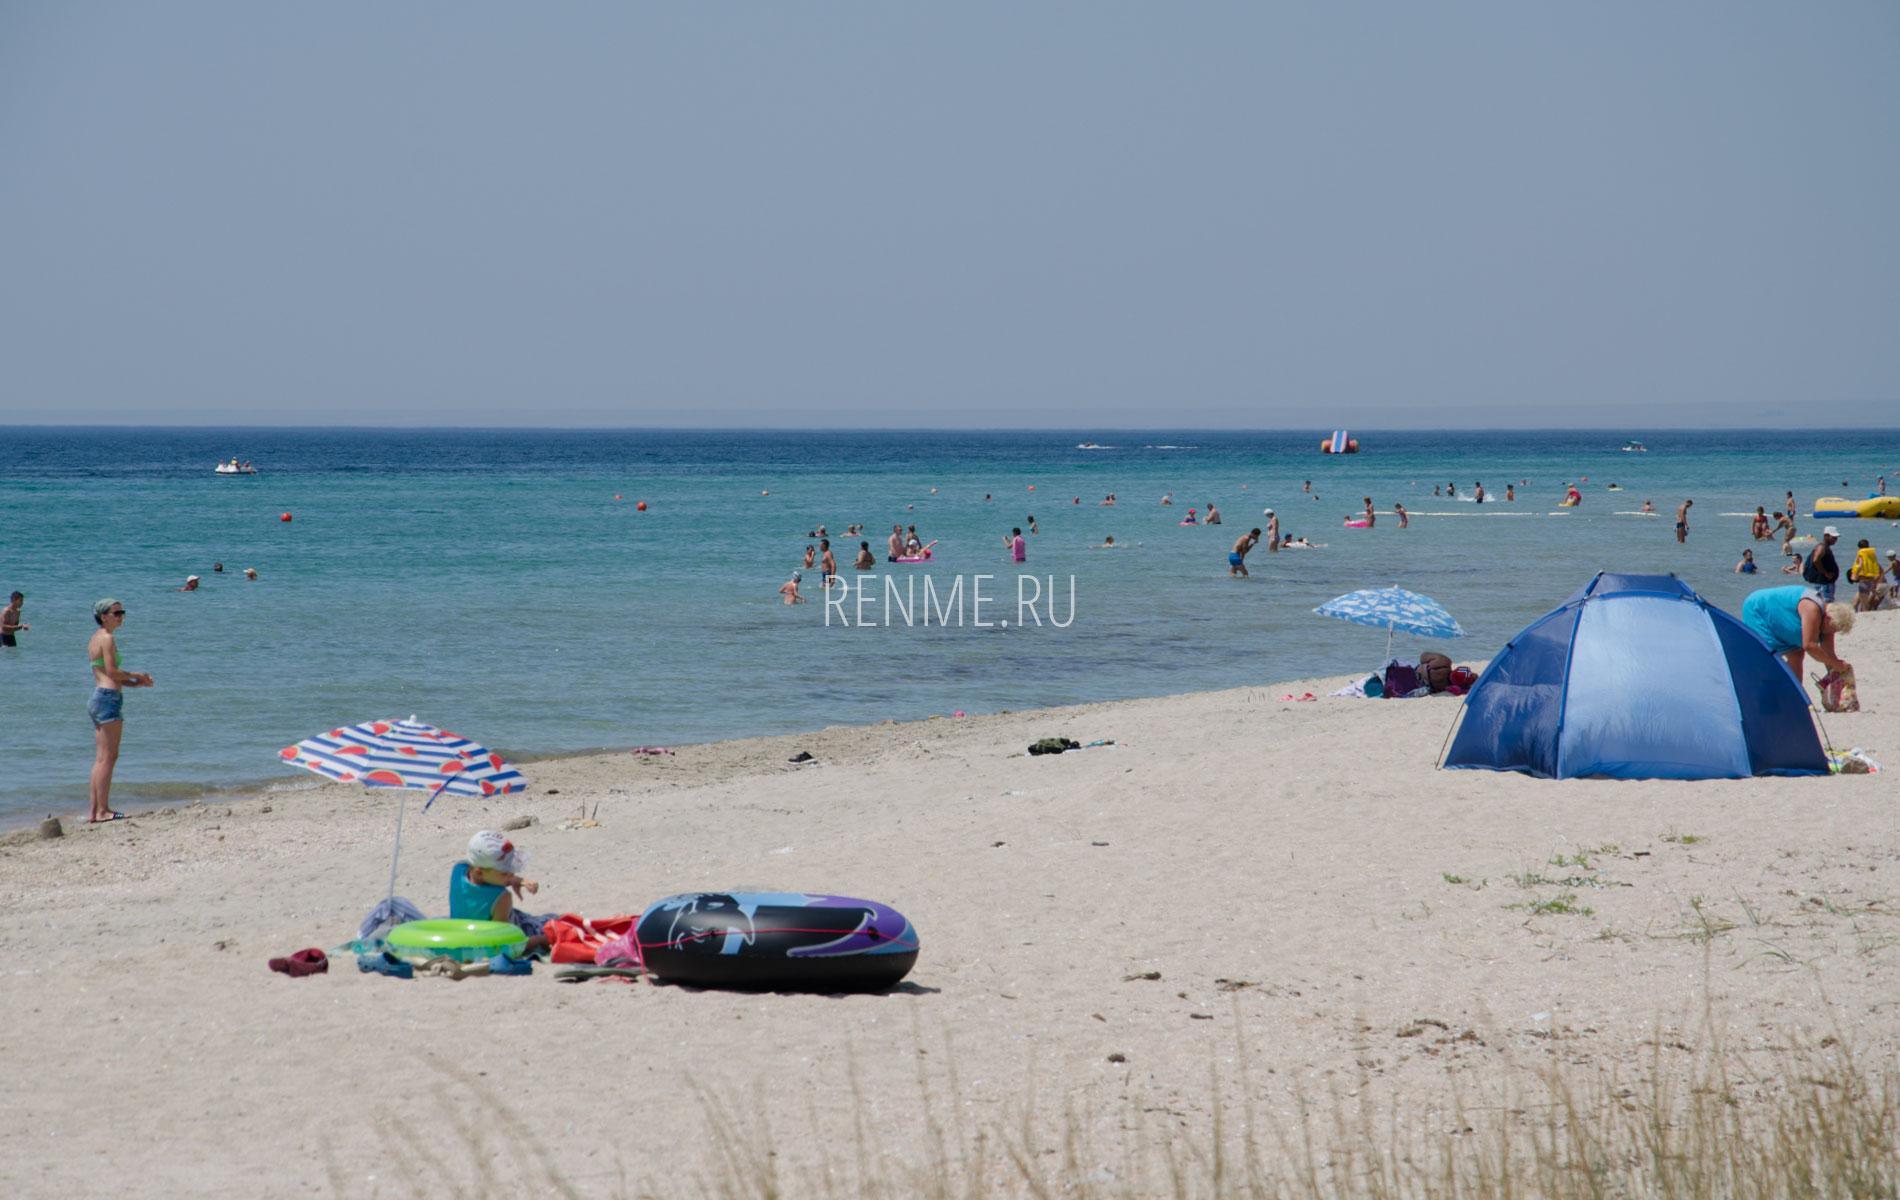 На берегу дикого пляжа в Крыму. Фото Штормового